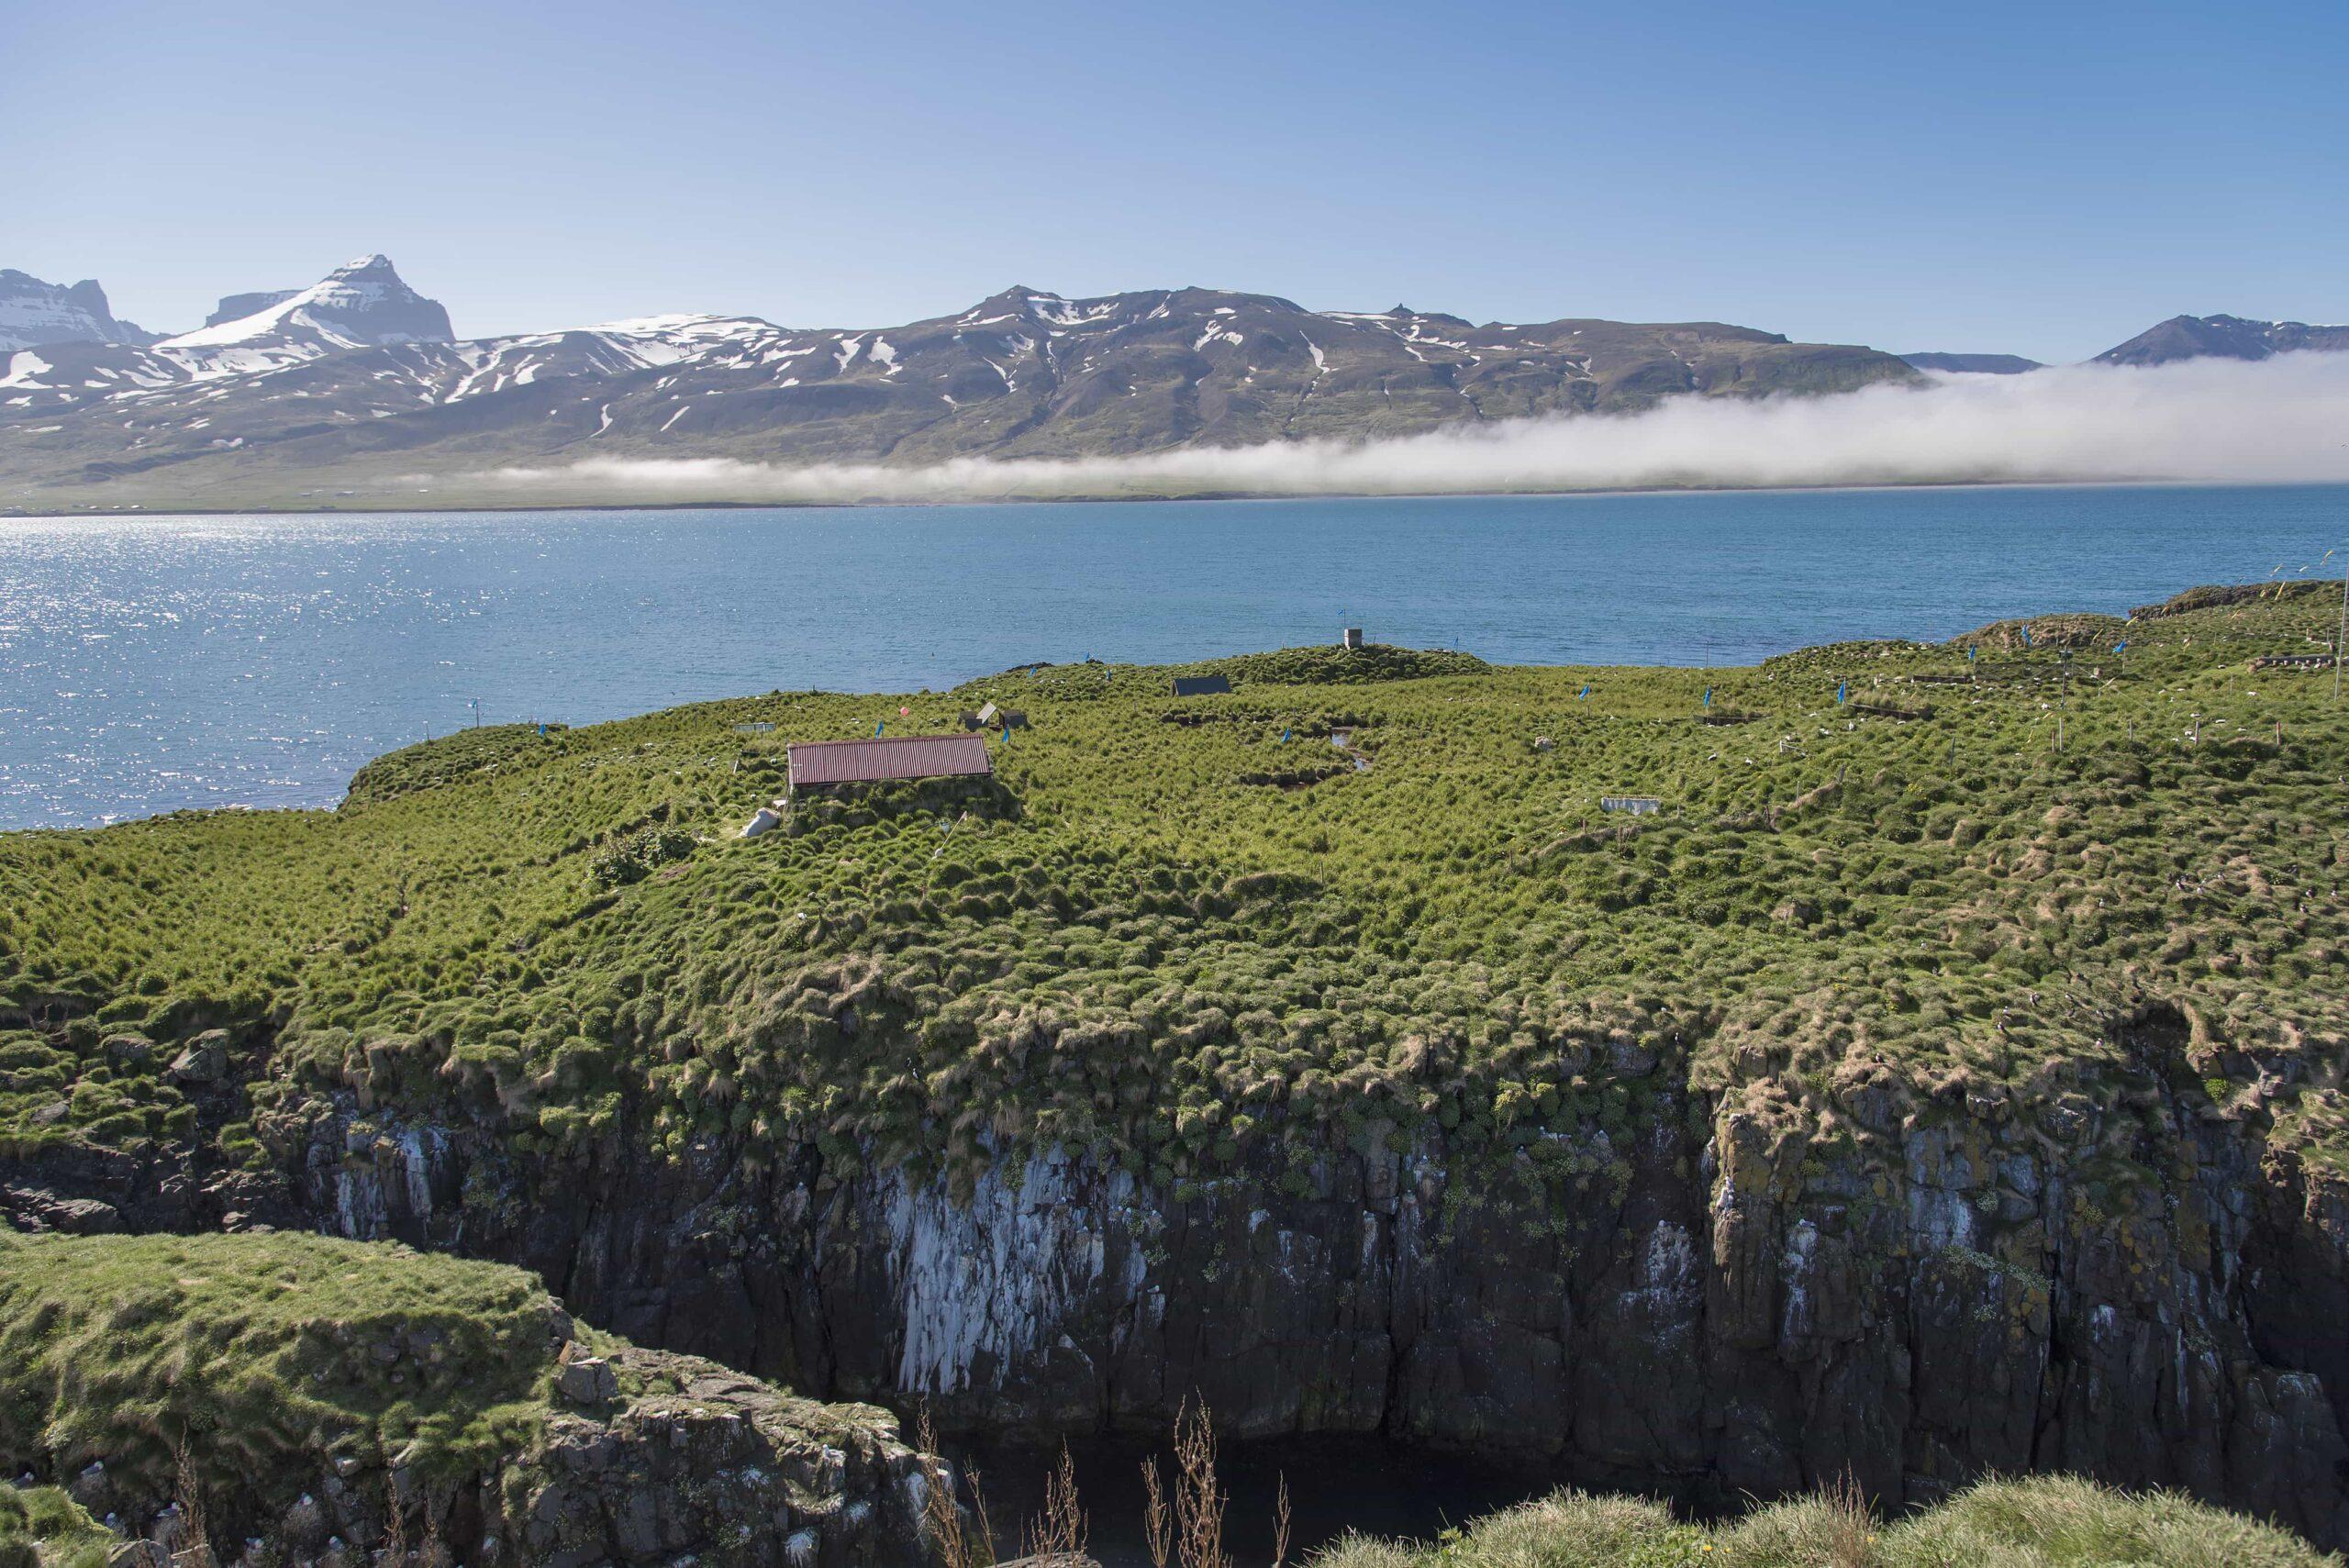 puffin cliffs in Borgarfjörður Eystri East Iceland